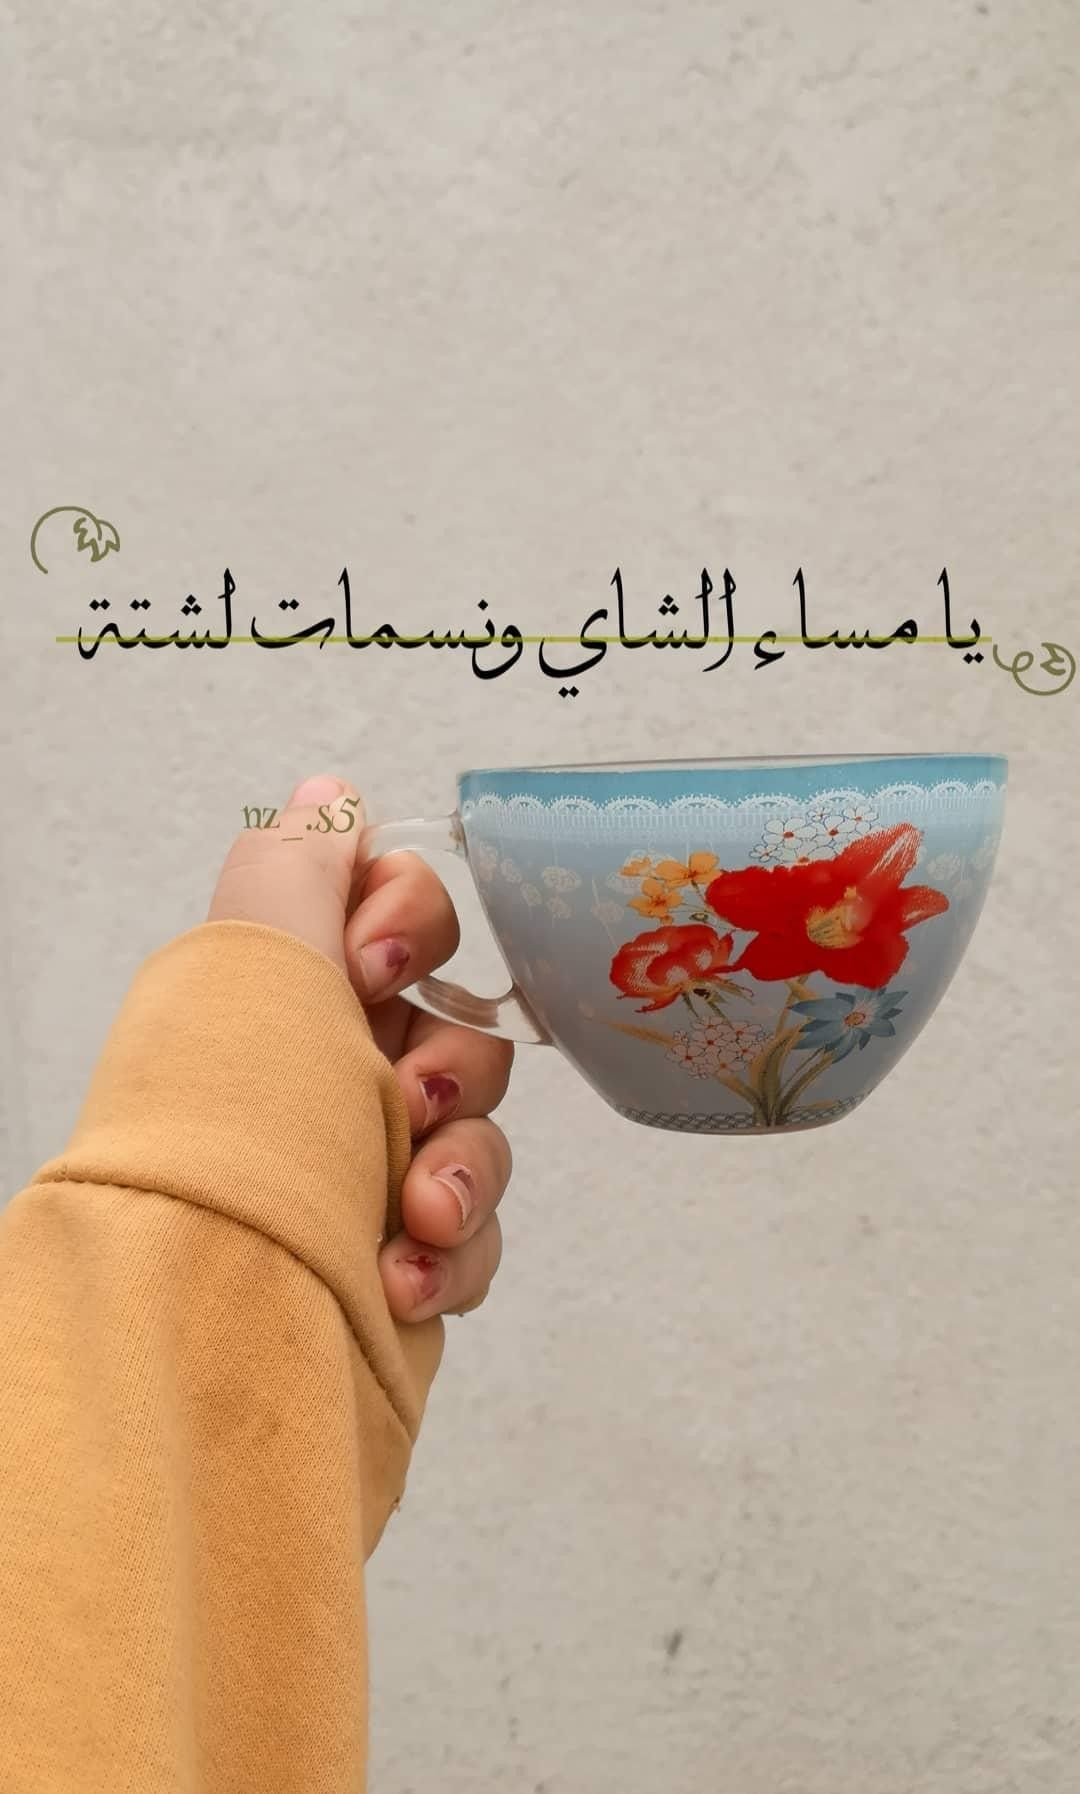 مساء الشاي Instagram Inspiration Posts Girly Images Instagram Inspiration